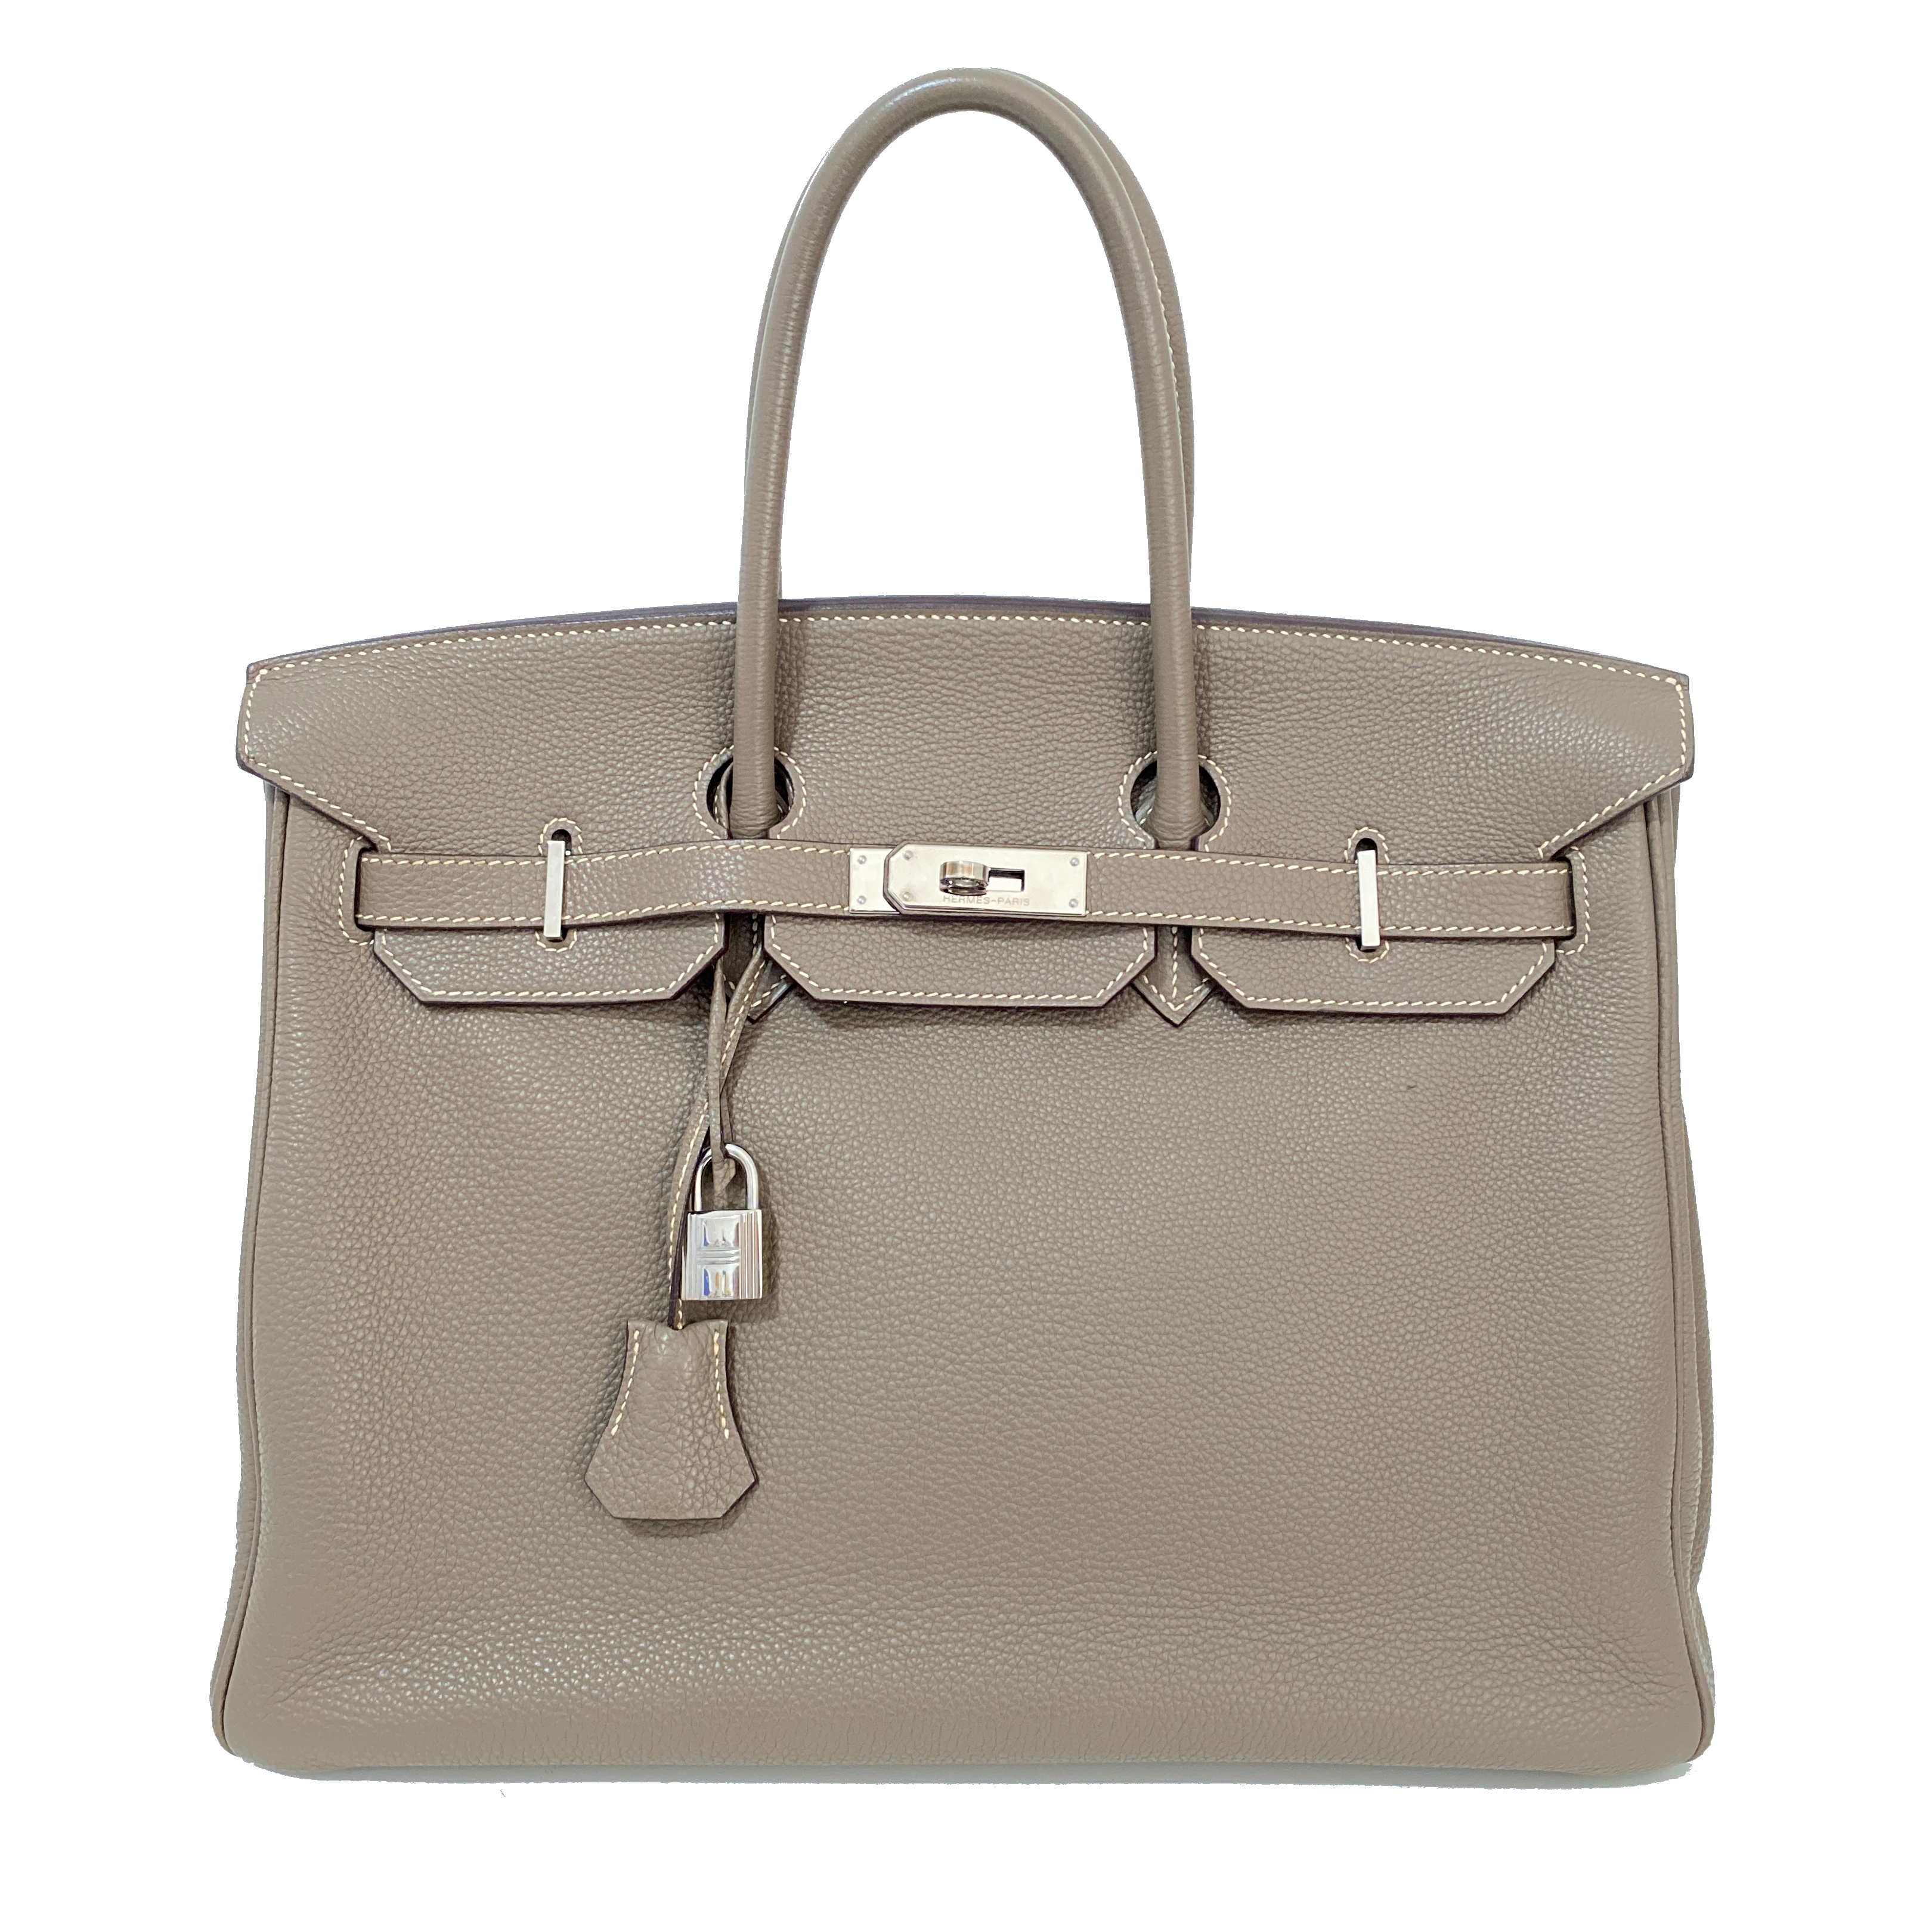 Hermes Etoupe 35cm Togo Leather Birkin